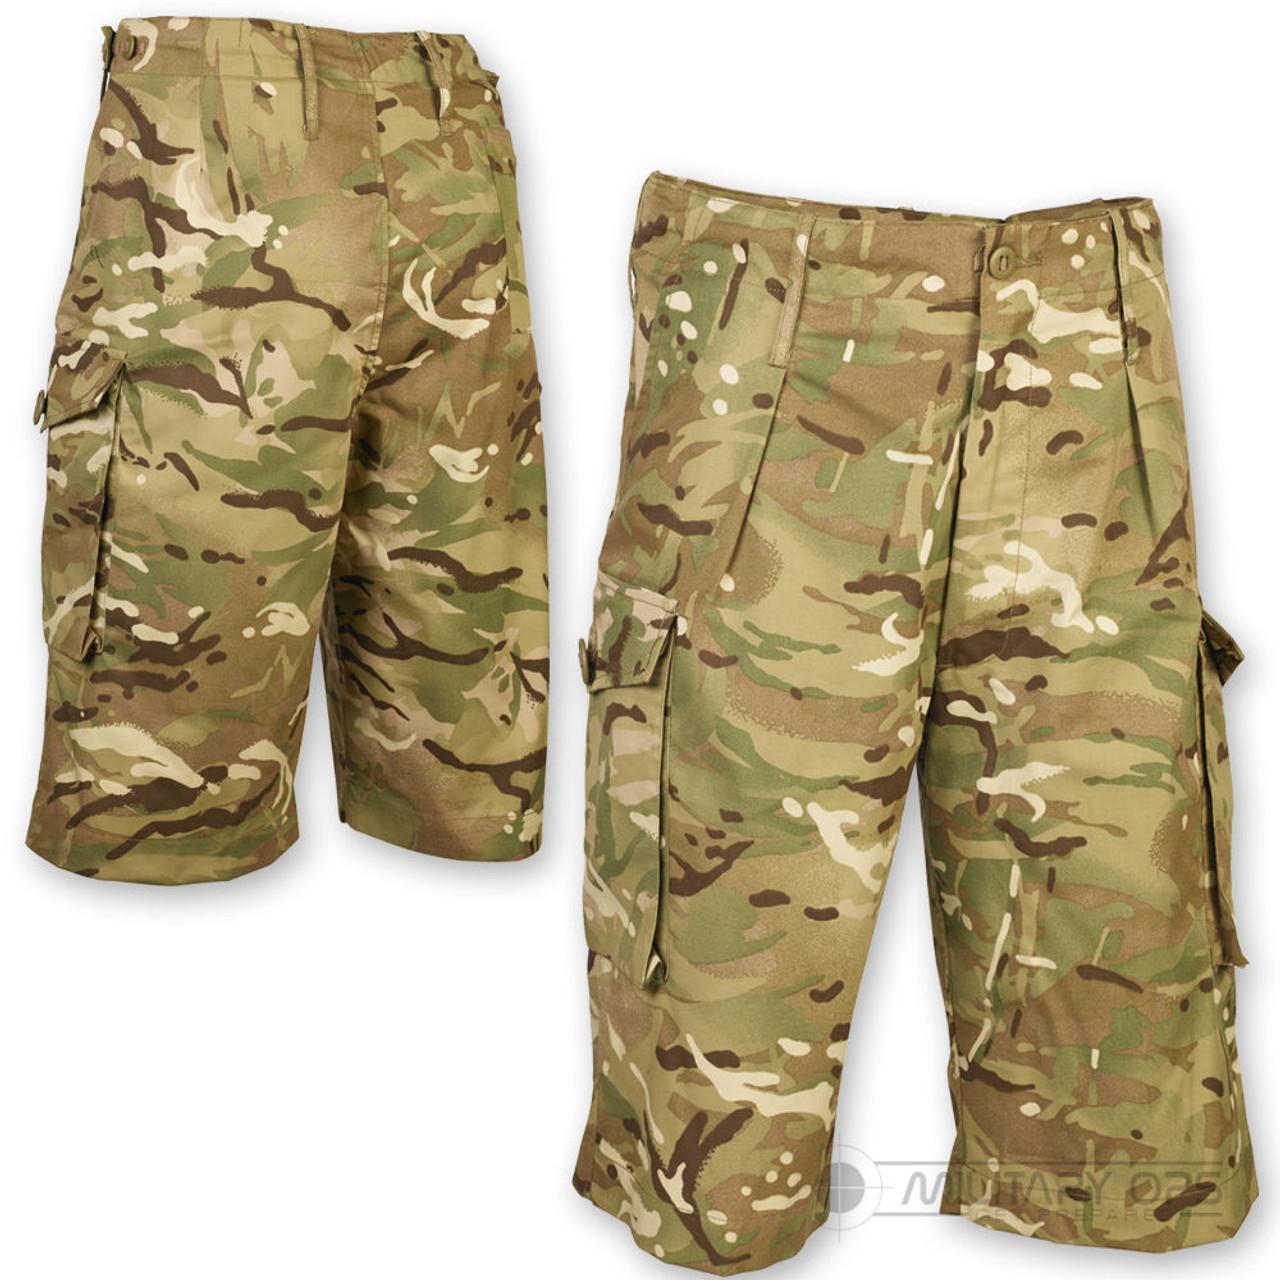 HELIKON PCS COMBAT SHIRT BRITISH ARMY MTP MULTICAM PANTS SOLDIER 95 STYLE JACKET